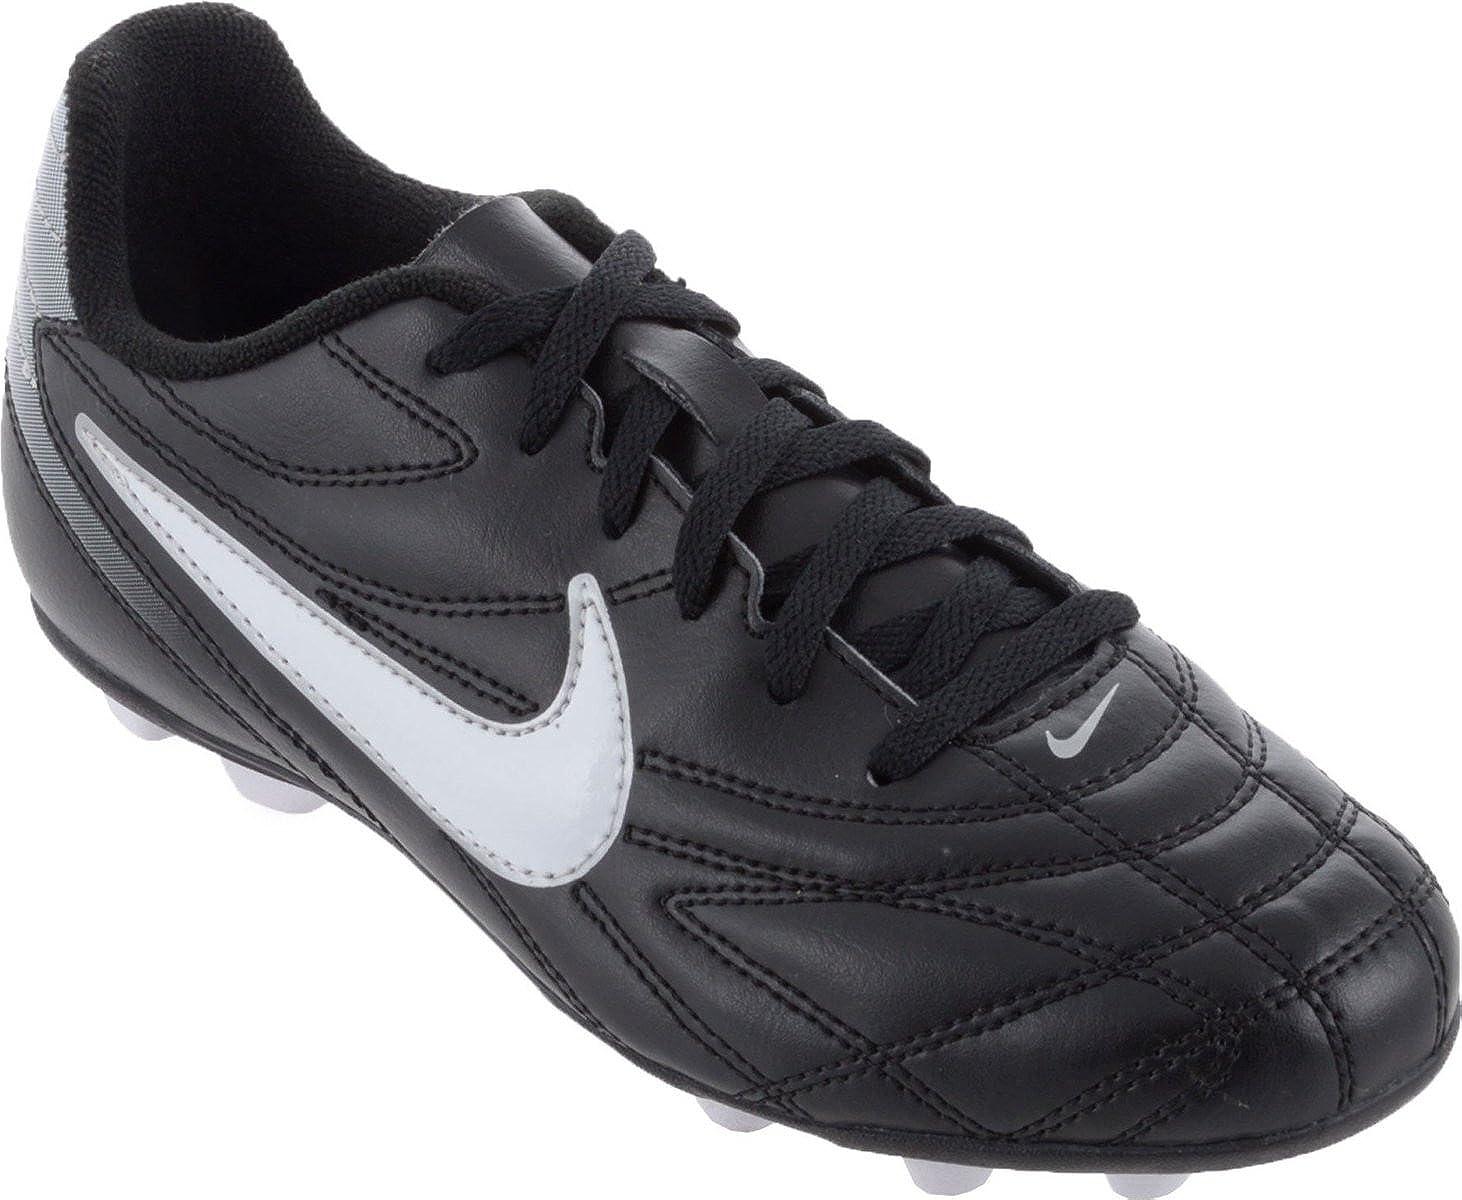 Nike Jr Premier III FG-R Youth Soccer Cleats 2Y